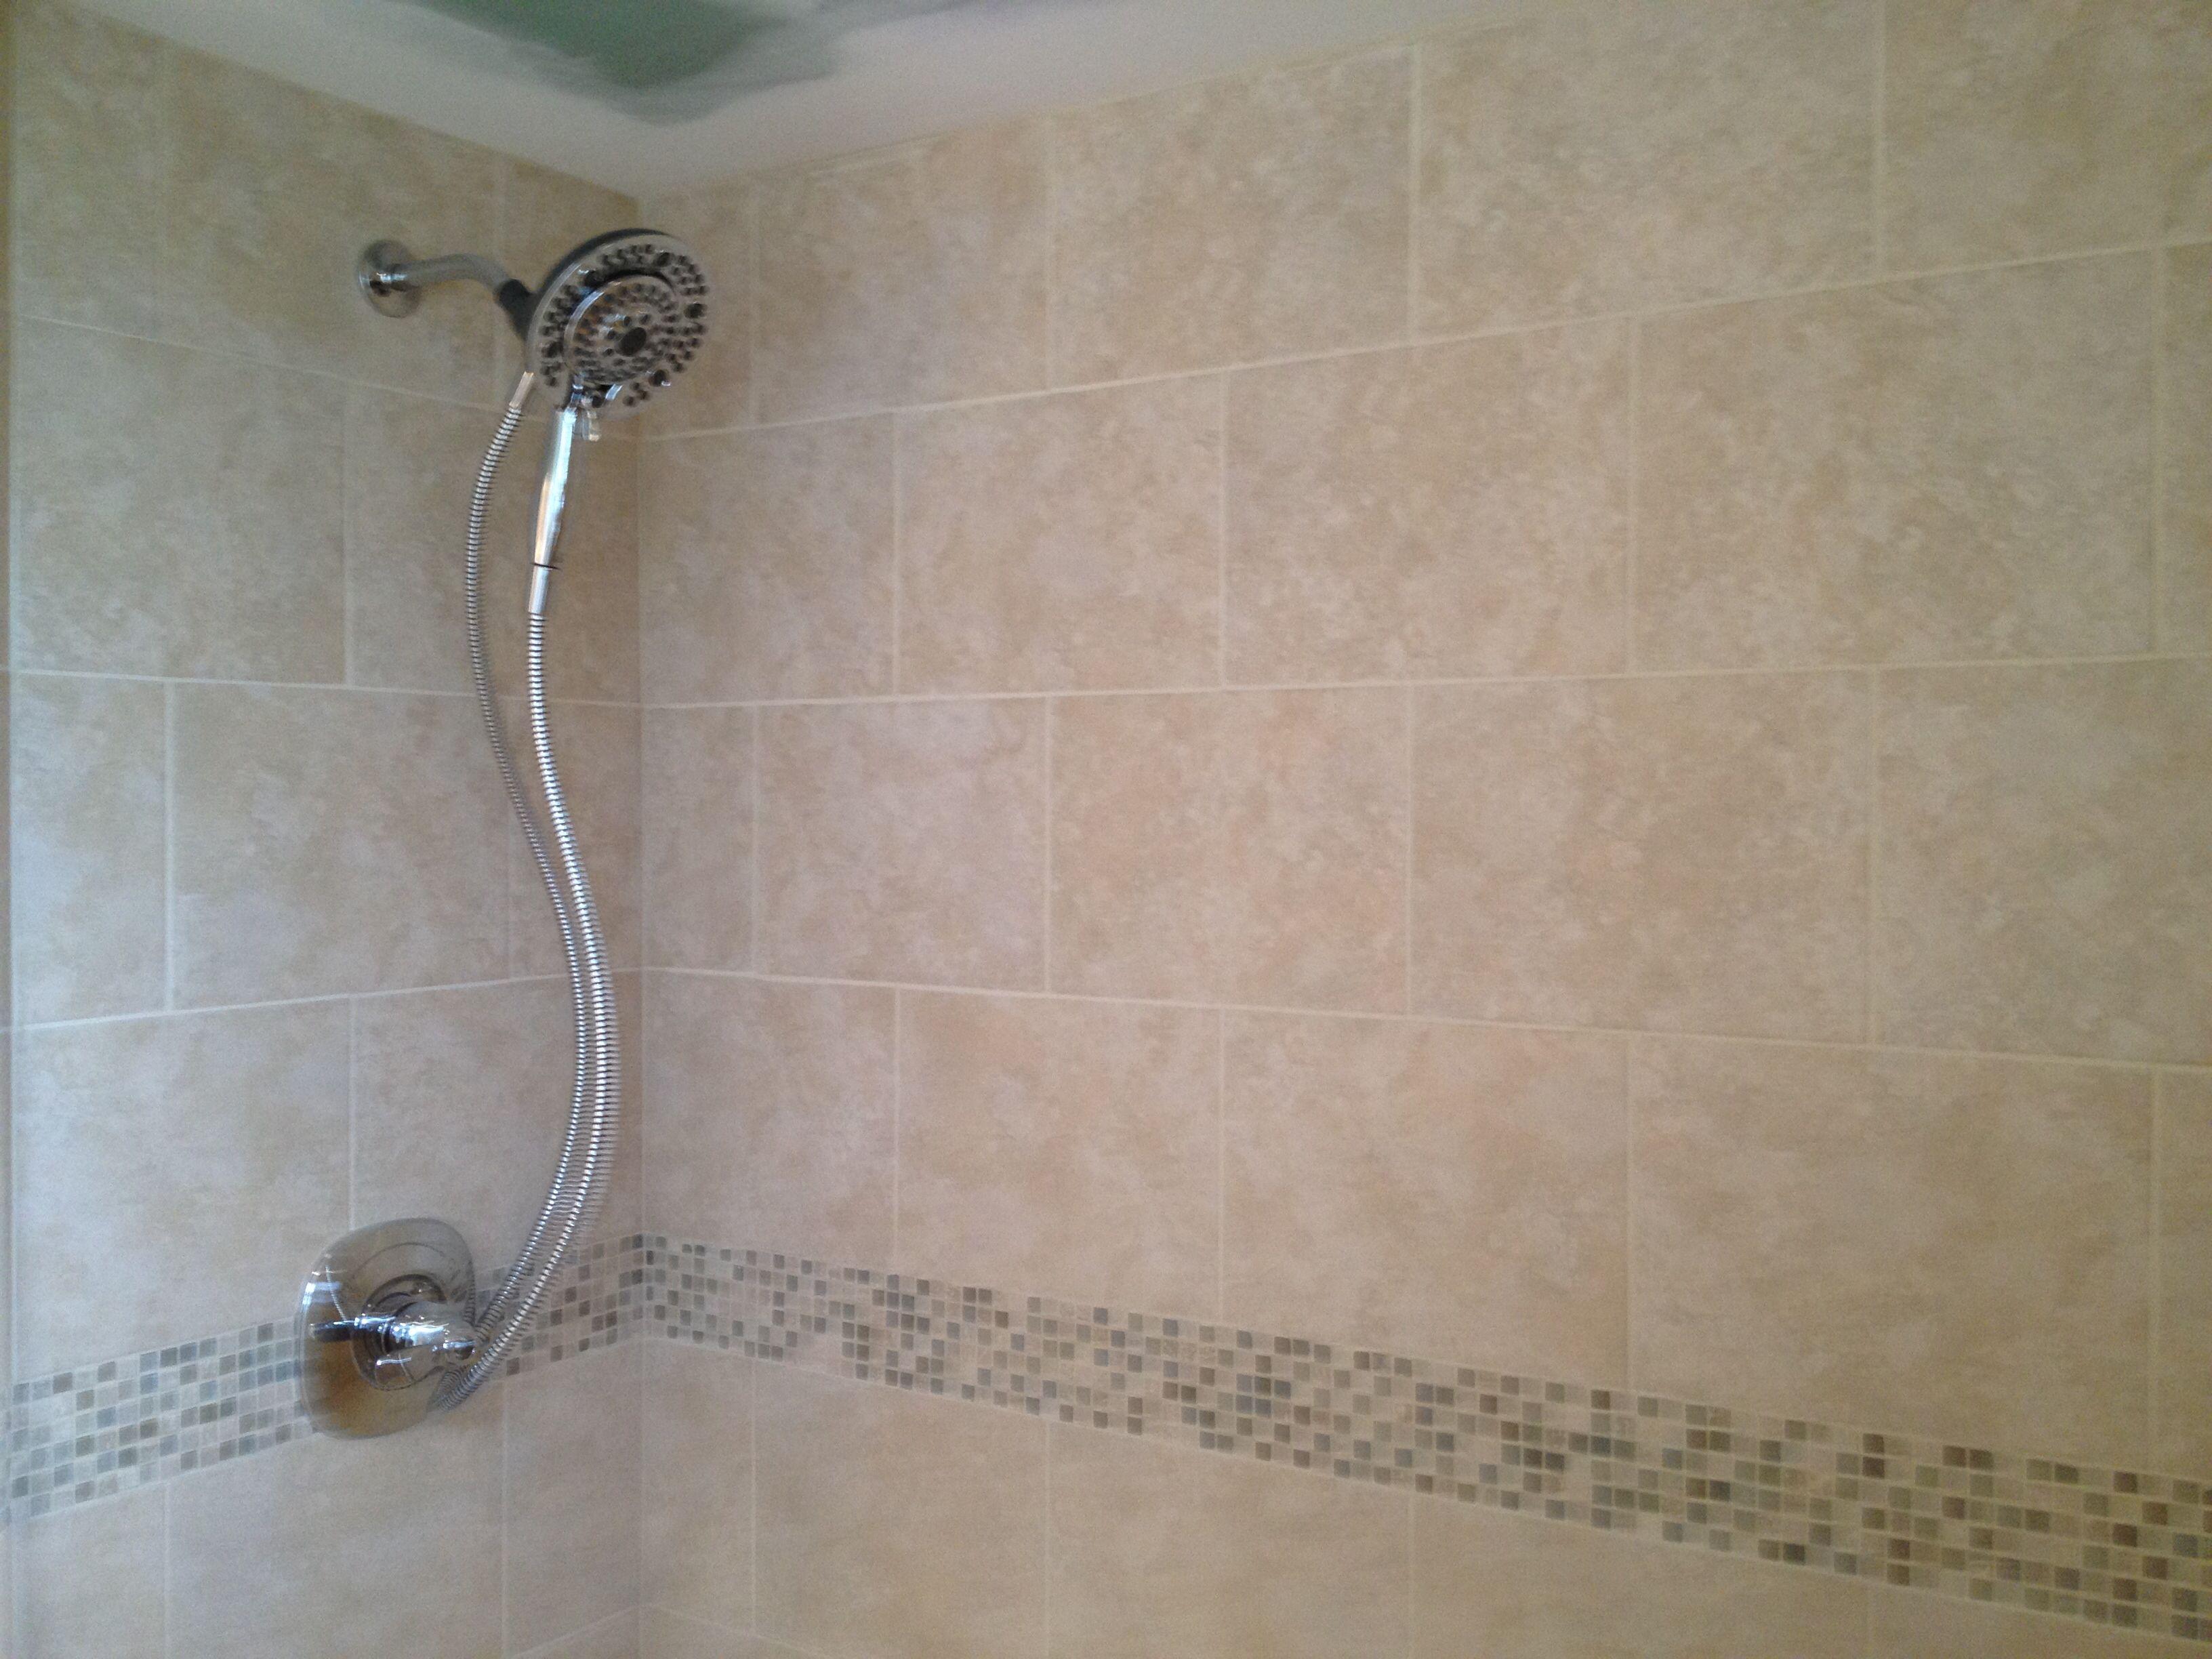 Mid america tile elk grove village - Master Bath Shower 10 X 13 Walls And 2 X 2 Floor Florida Tile